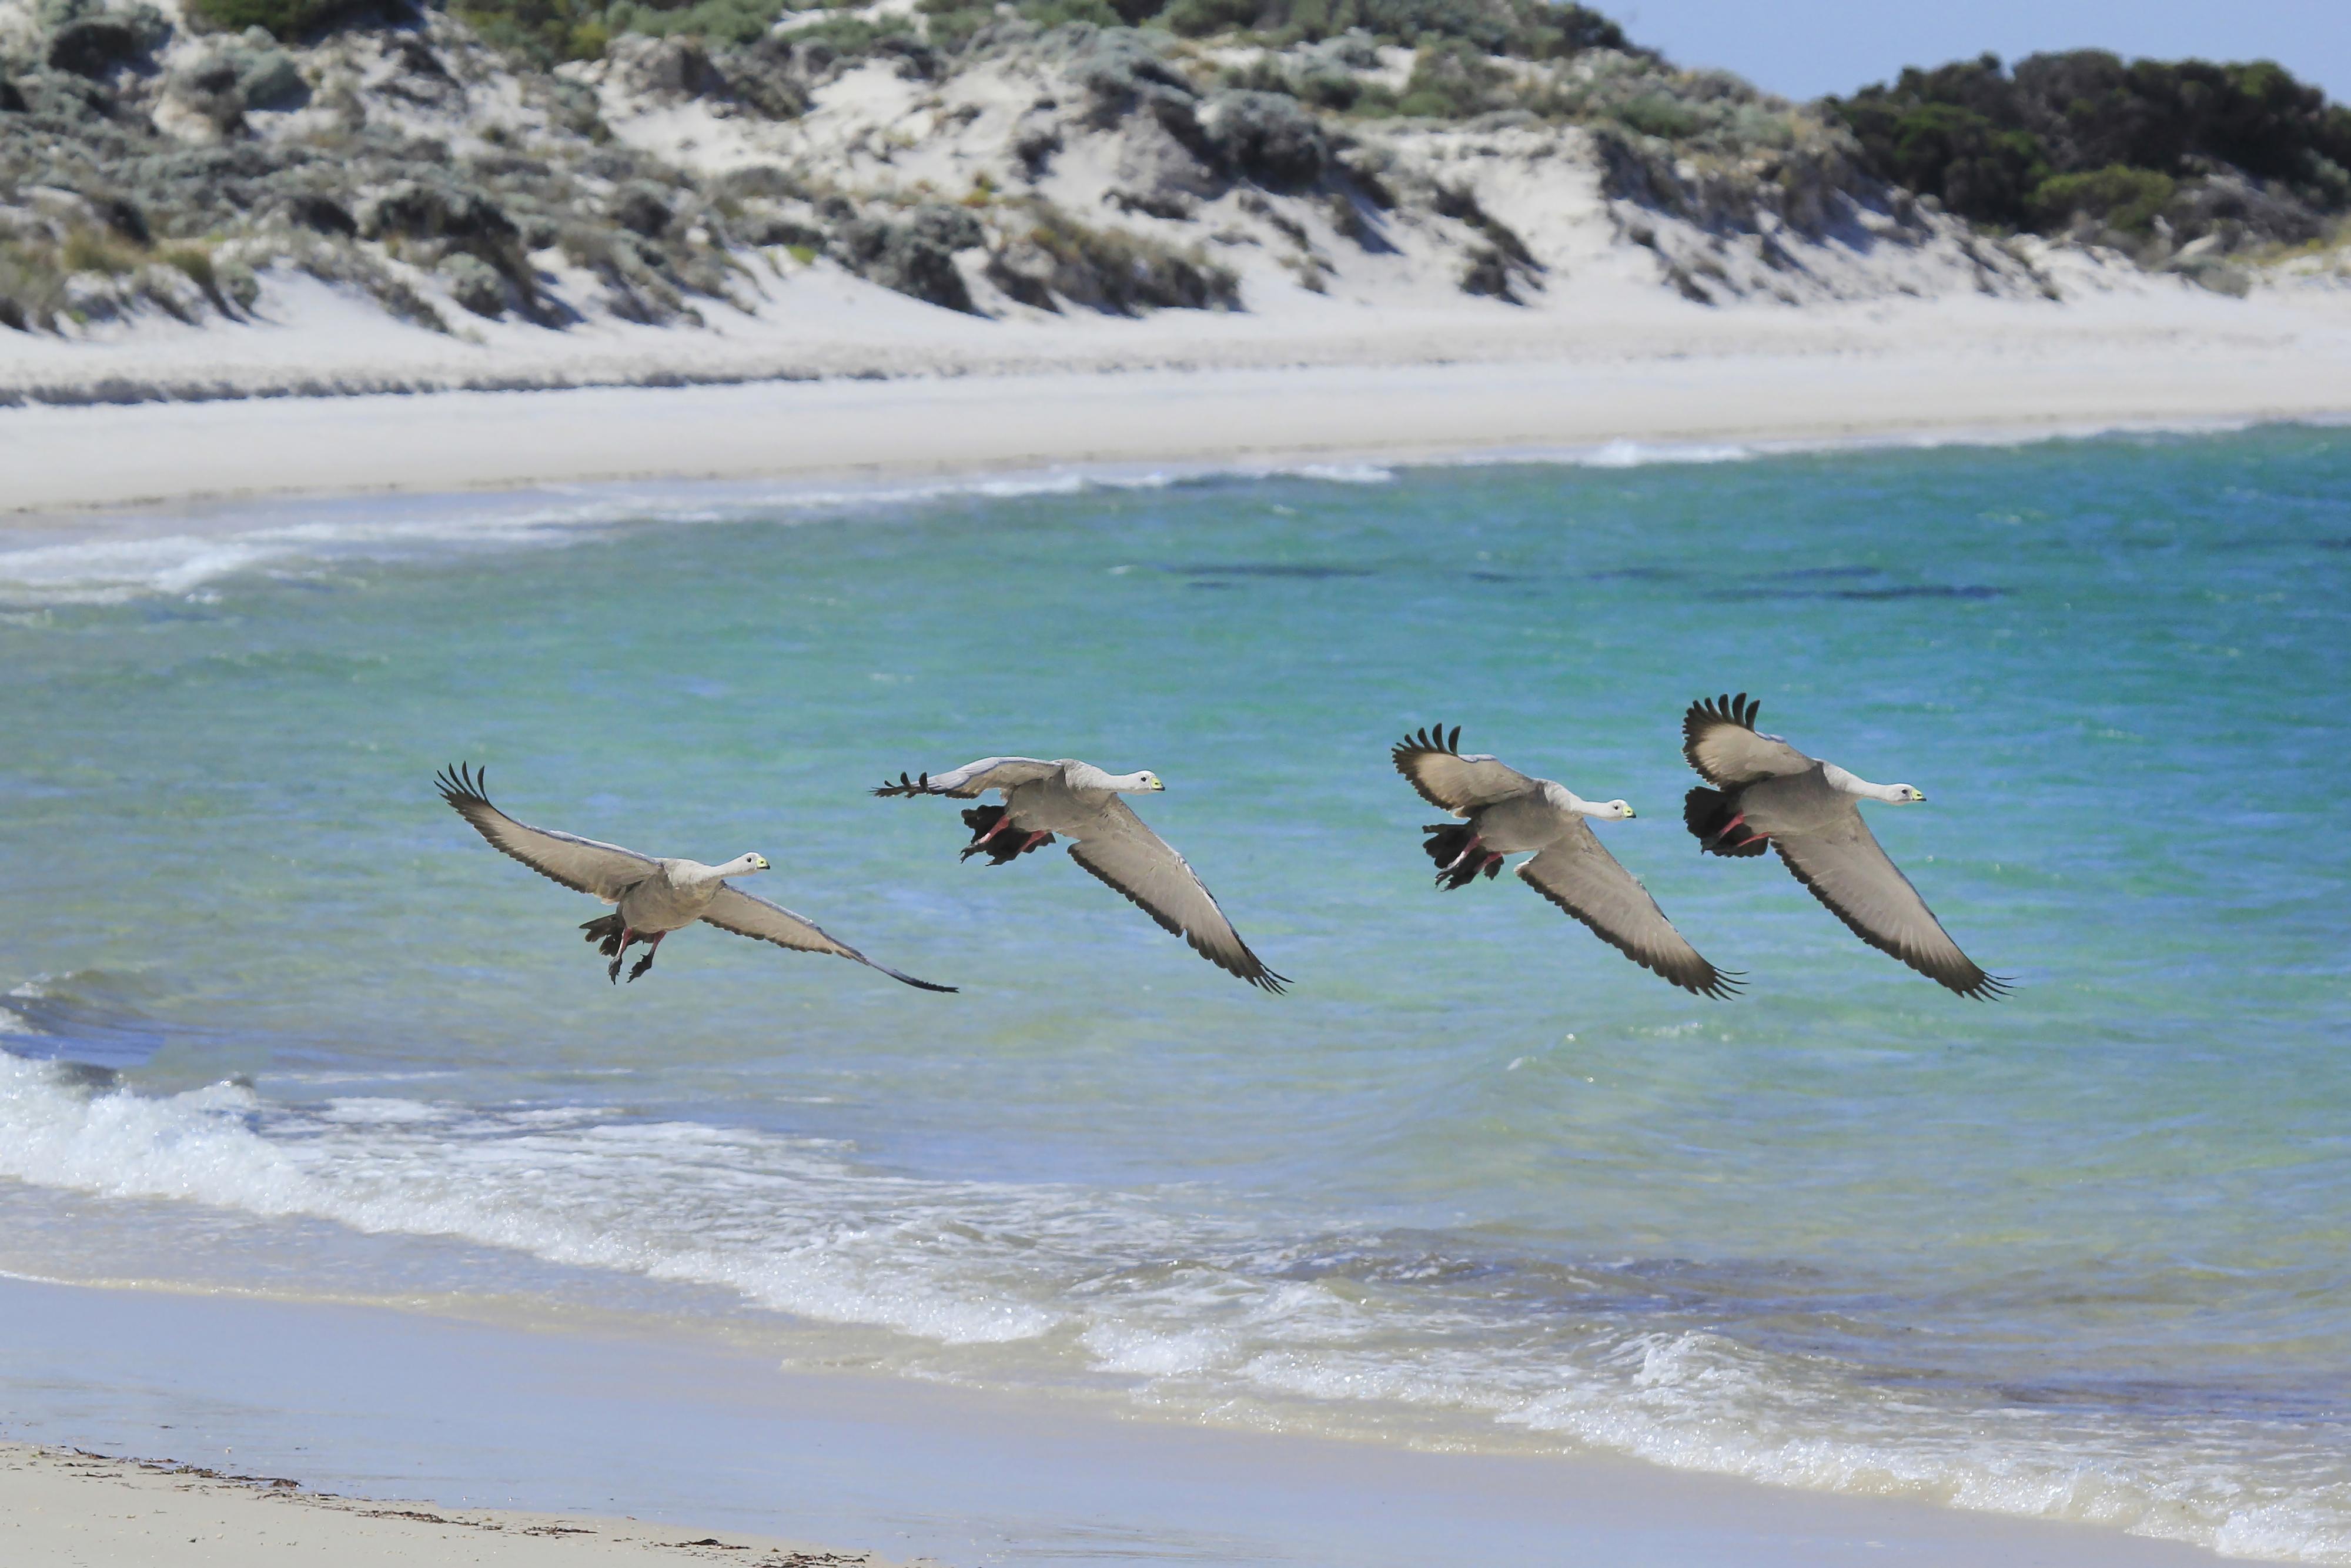 Sea birds of the Eyre Peninsula - Photo Credit: John White